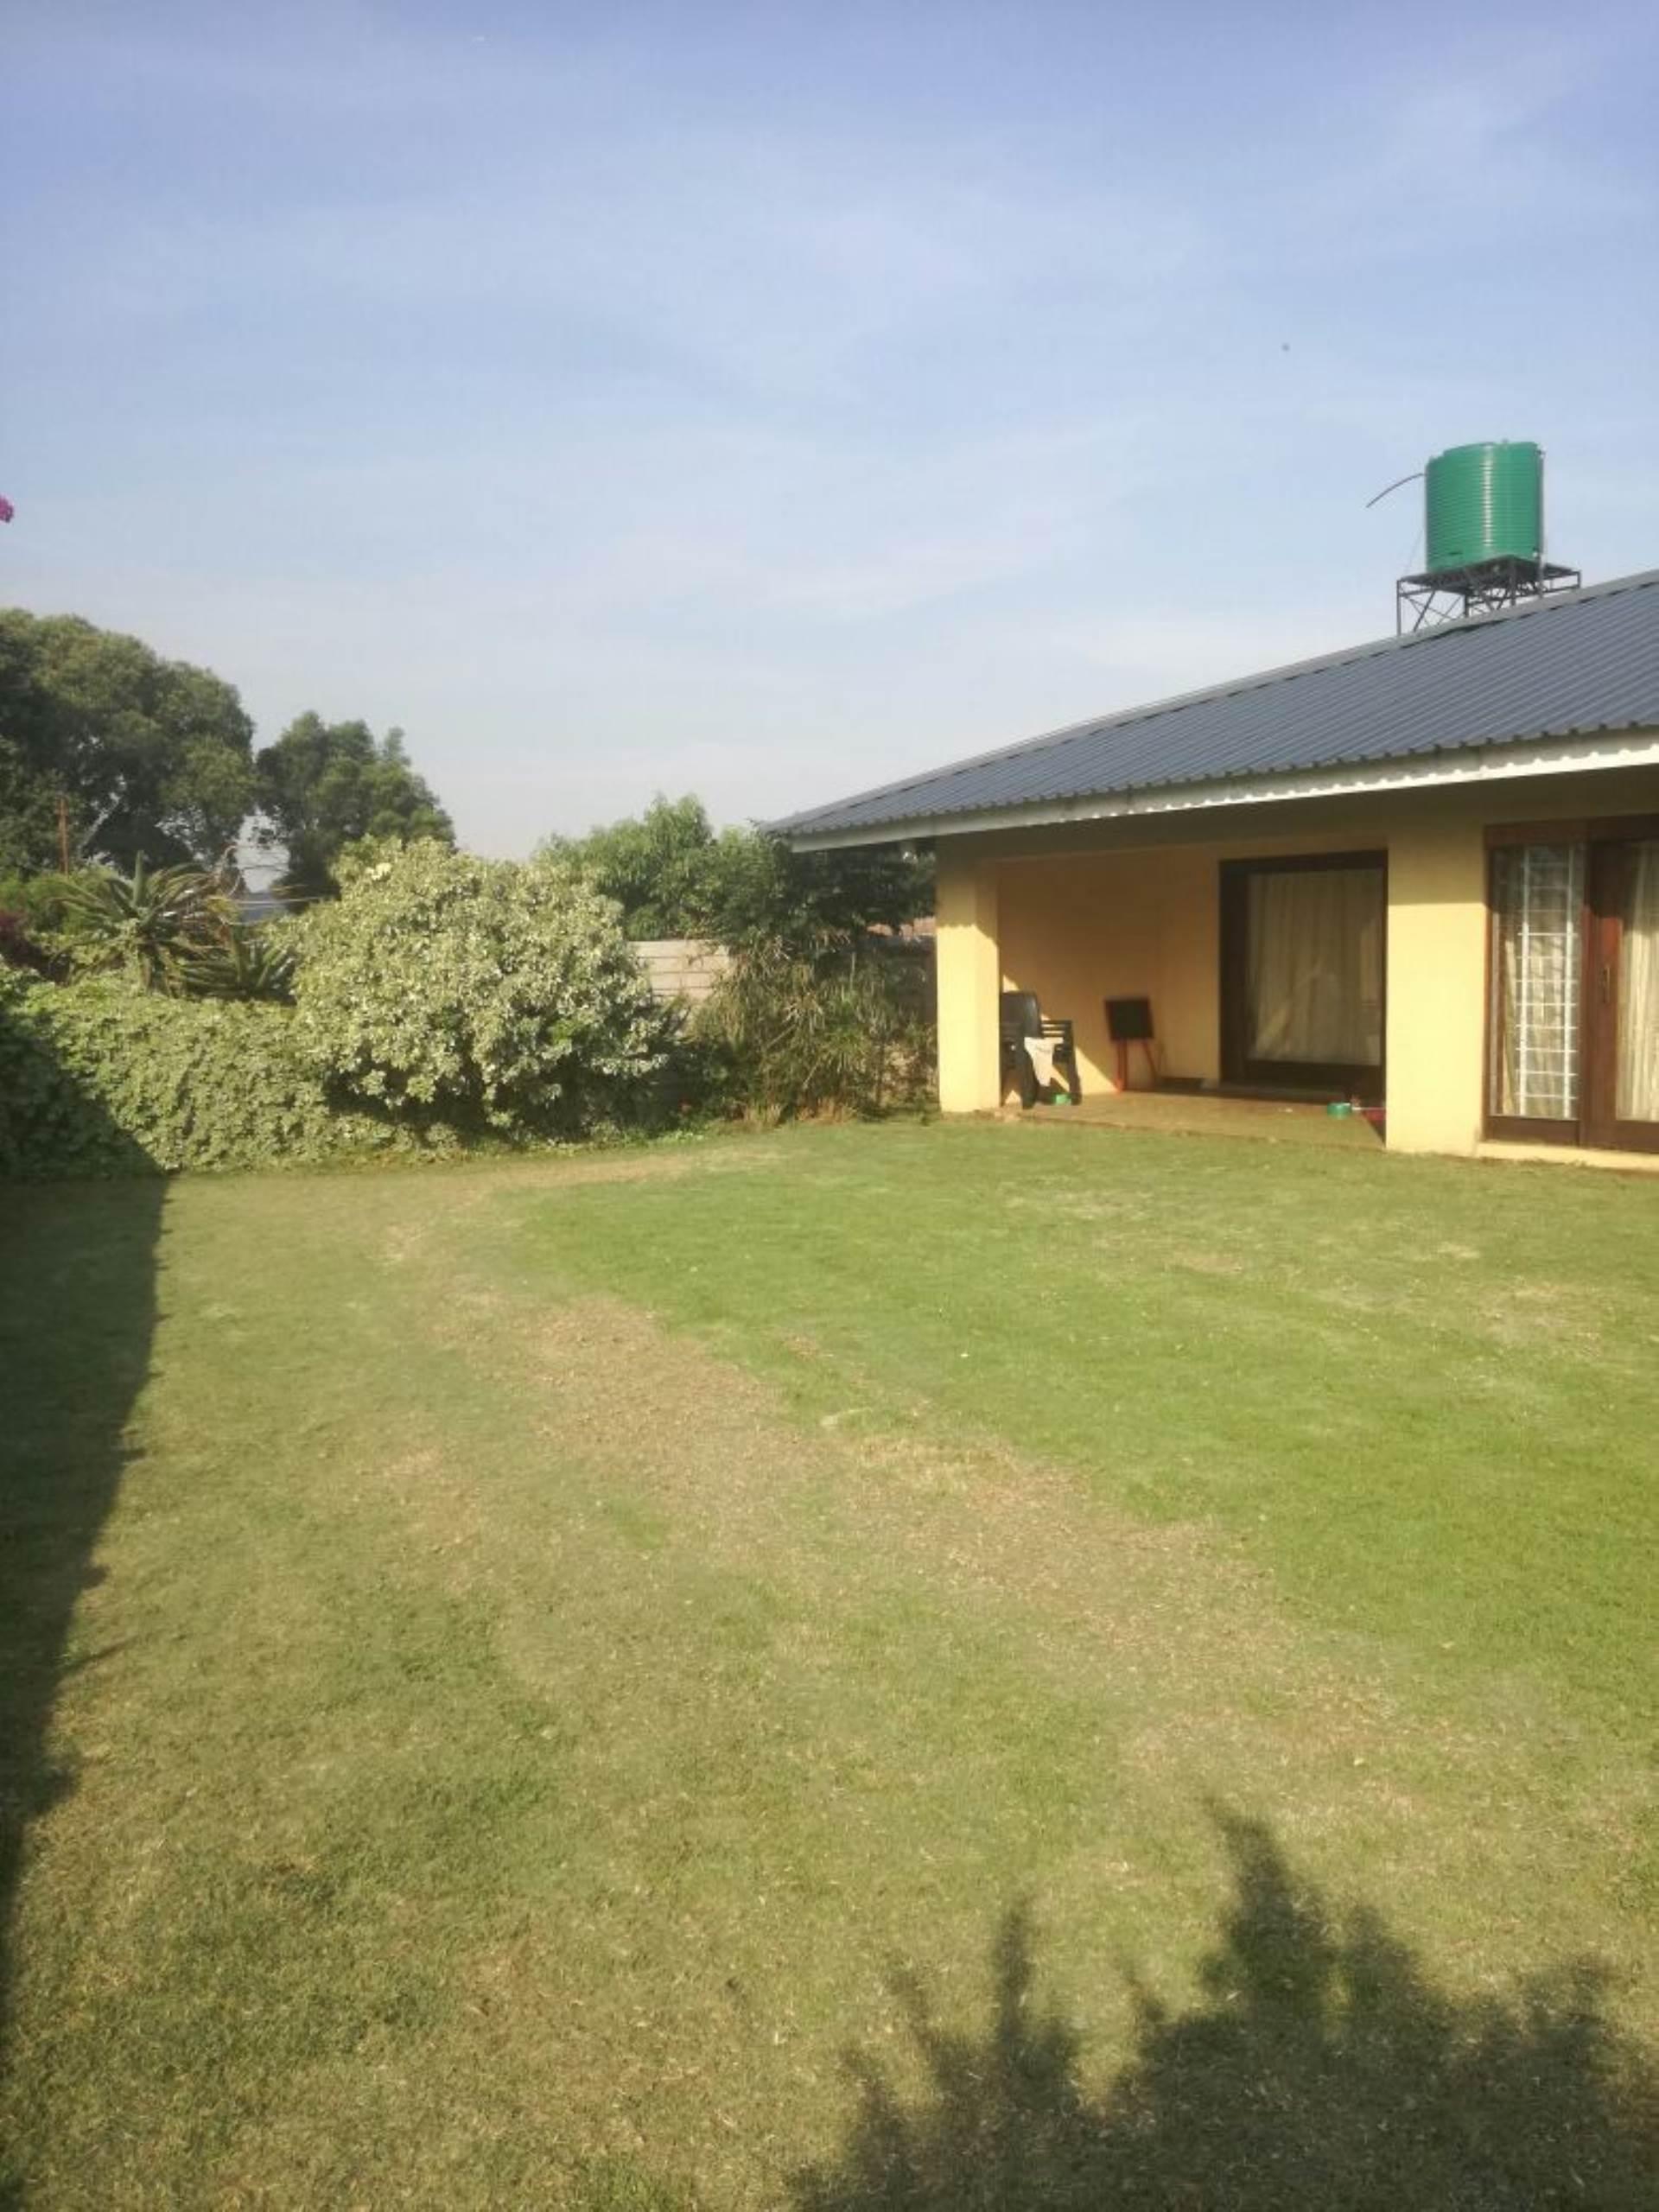 3 BedroomHouse To Rent In Cloverdene